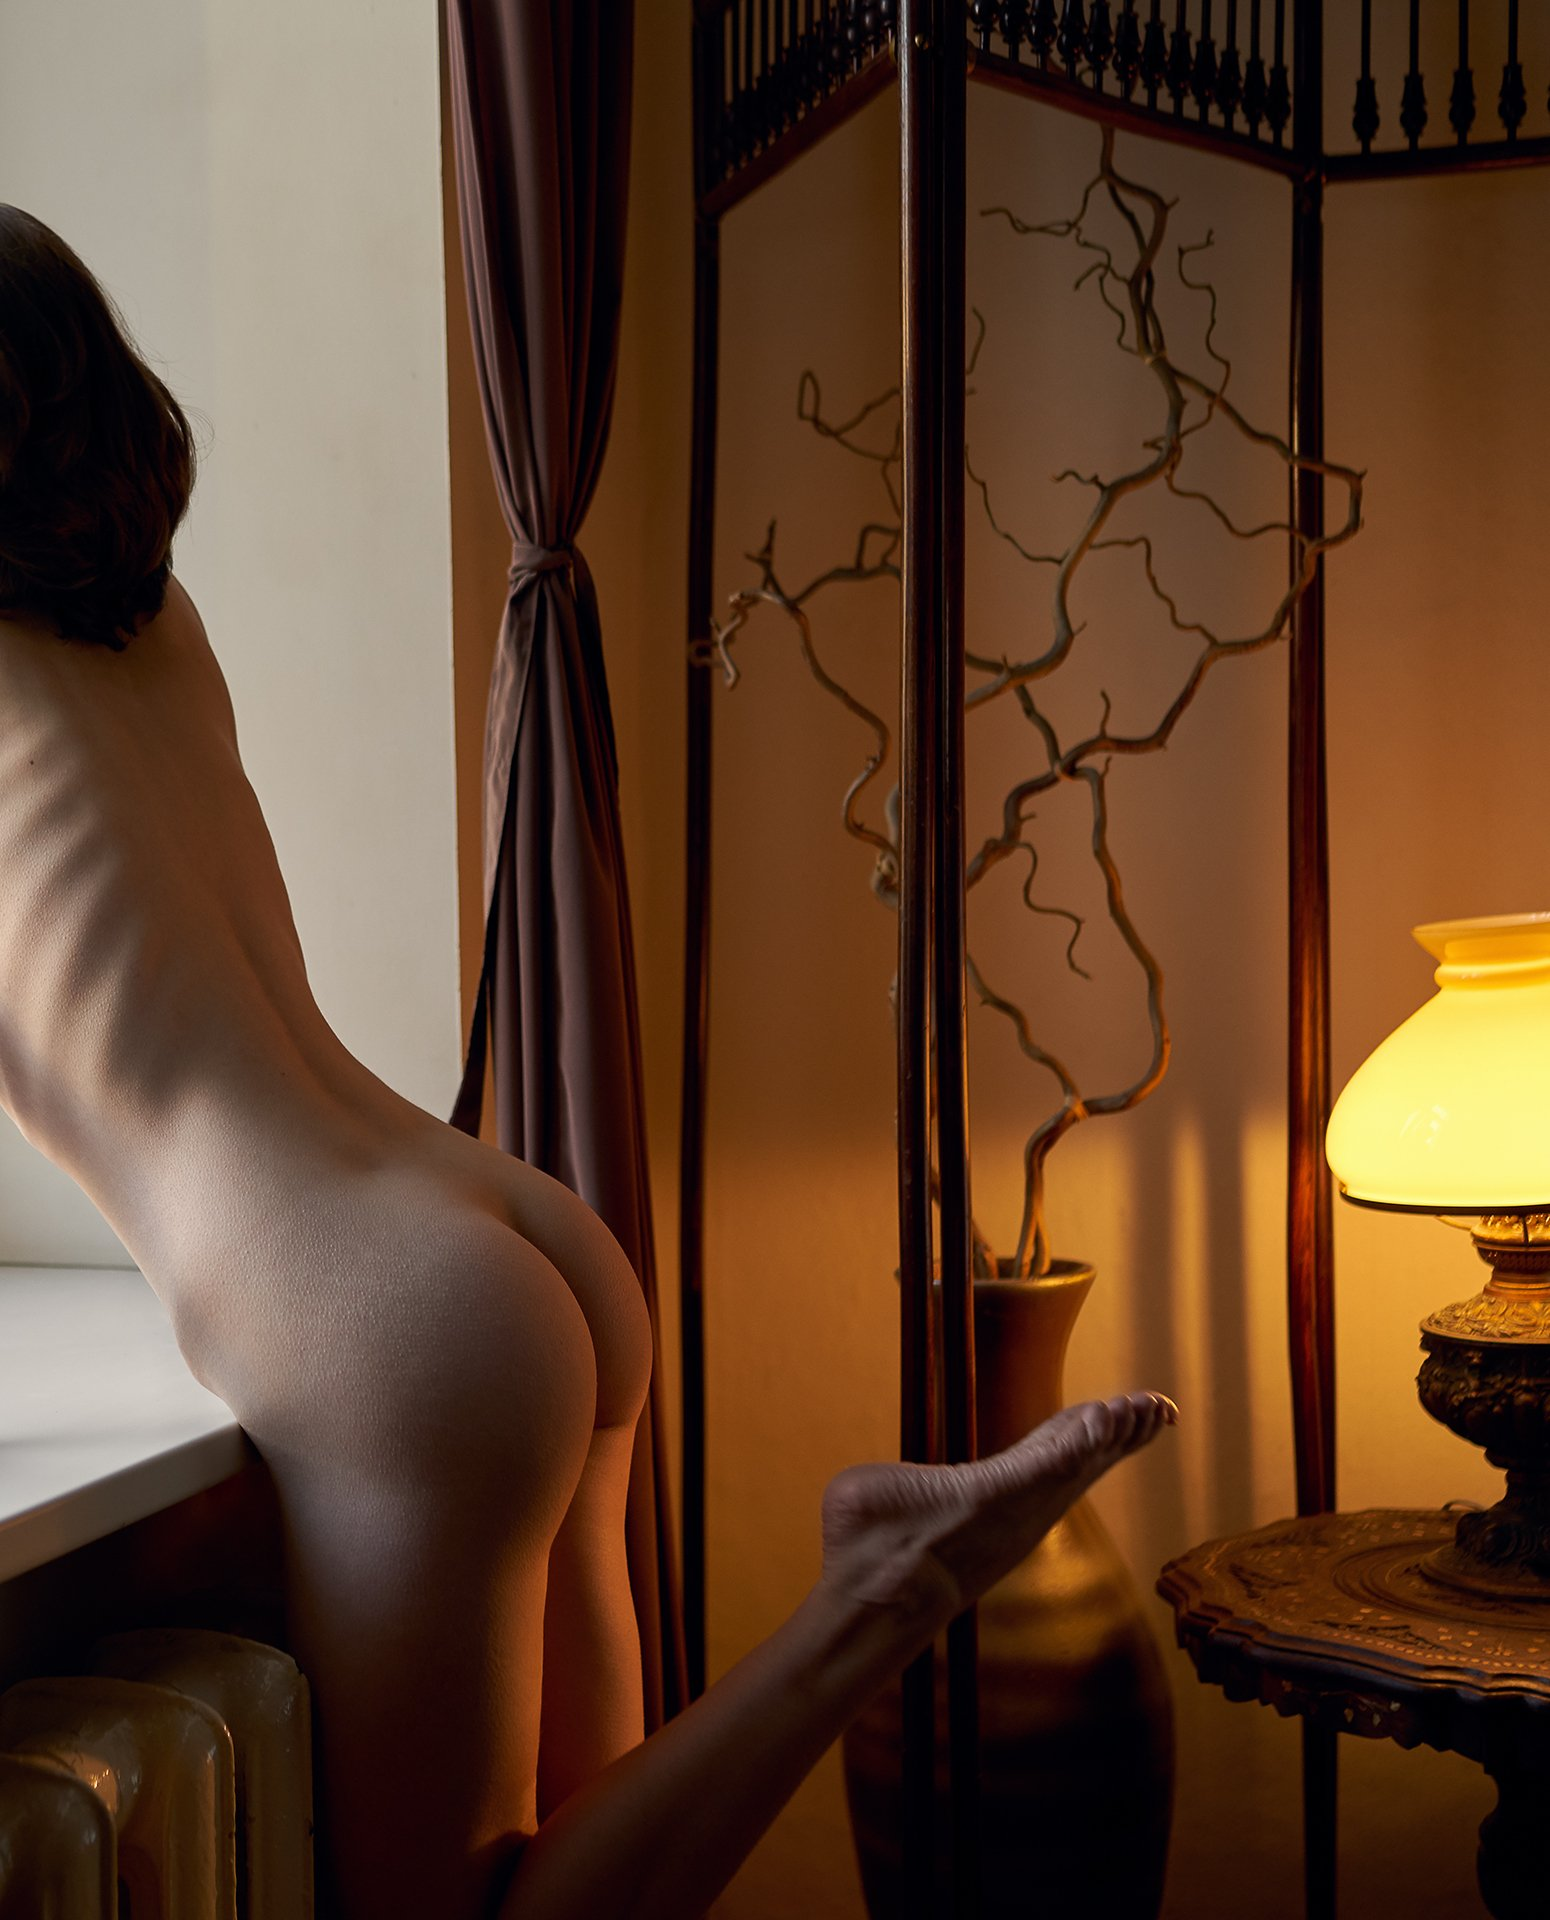 girl, nude, naked, at home, lamp, saint-petersburg, window, light, body, Роман Филиппов